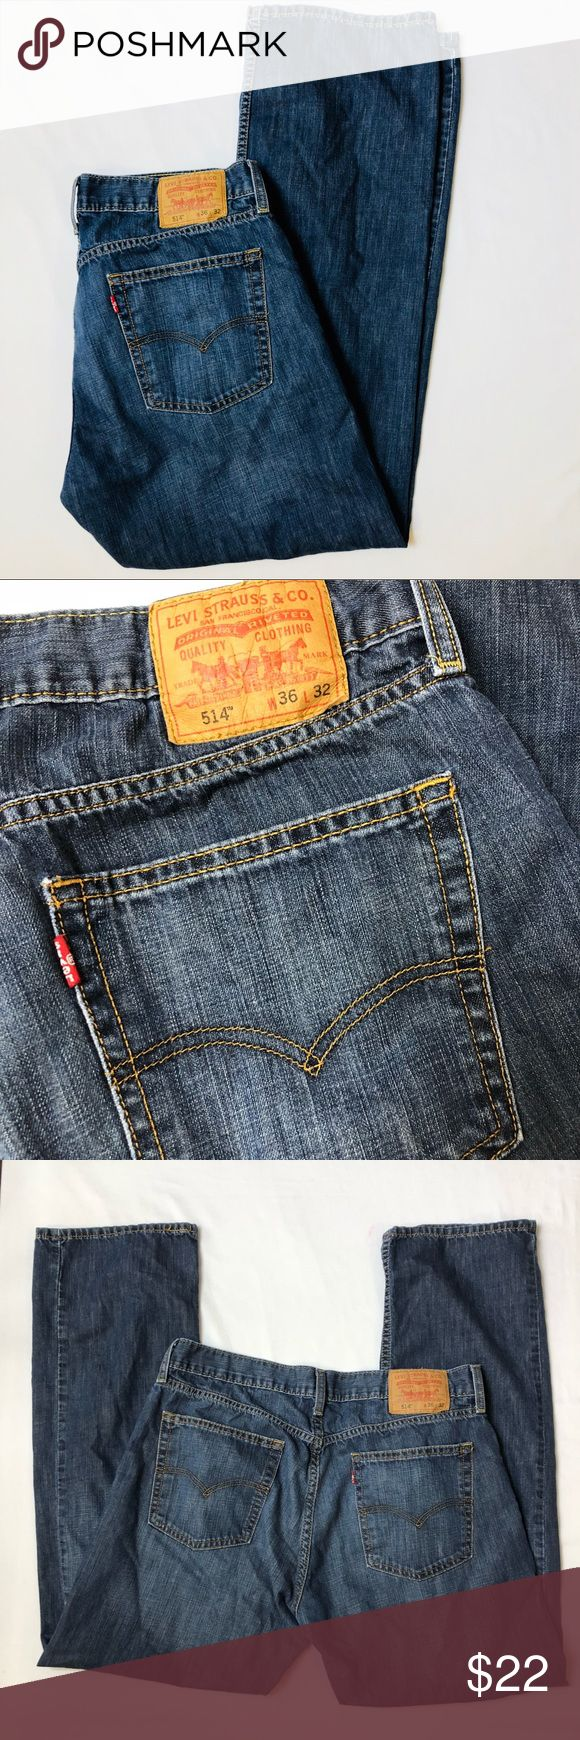 Levis Jeans 36 x 32 514 Slim Straight Levis Jeans 514 Slim Straight 36 x 32 Levi's Jeans